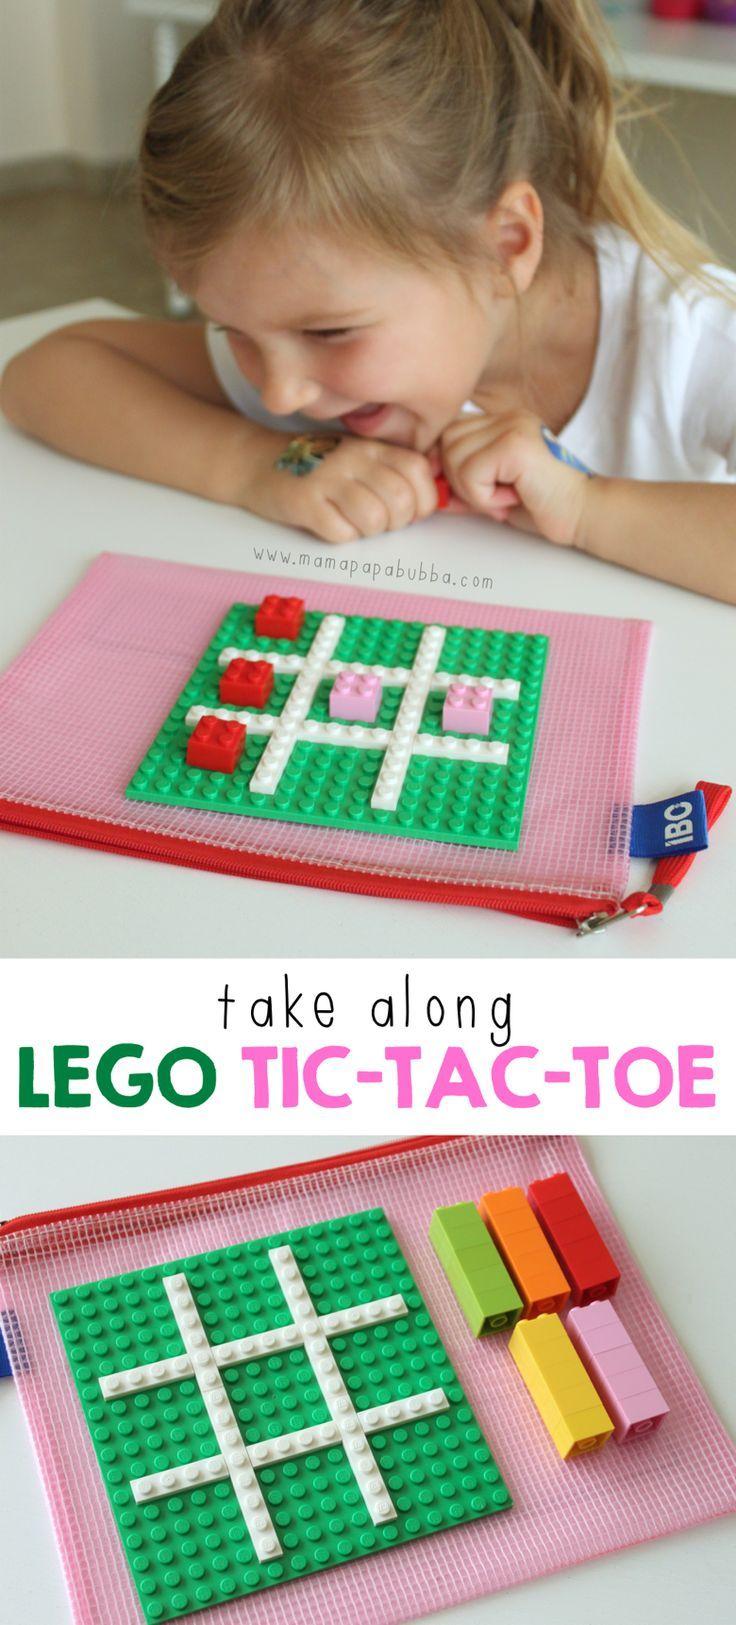 Toys car png  Take Along LEGO TicTacToe  MamaPapaBubbag  Legos